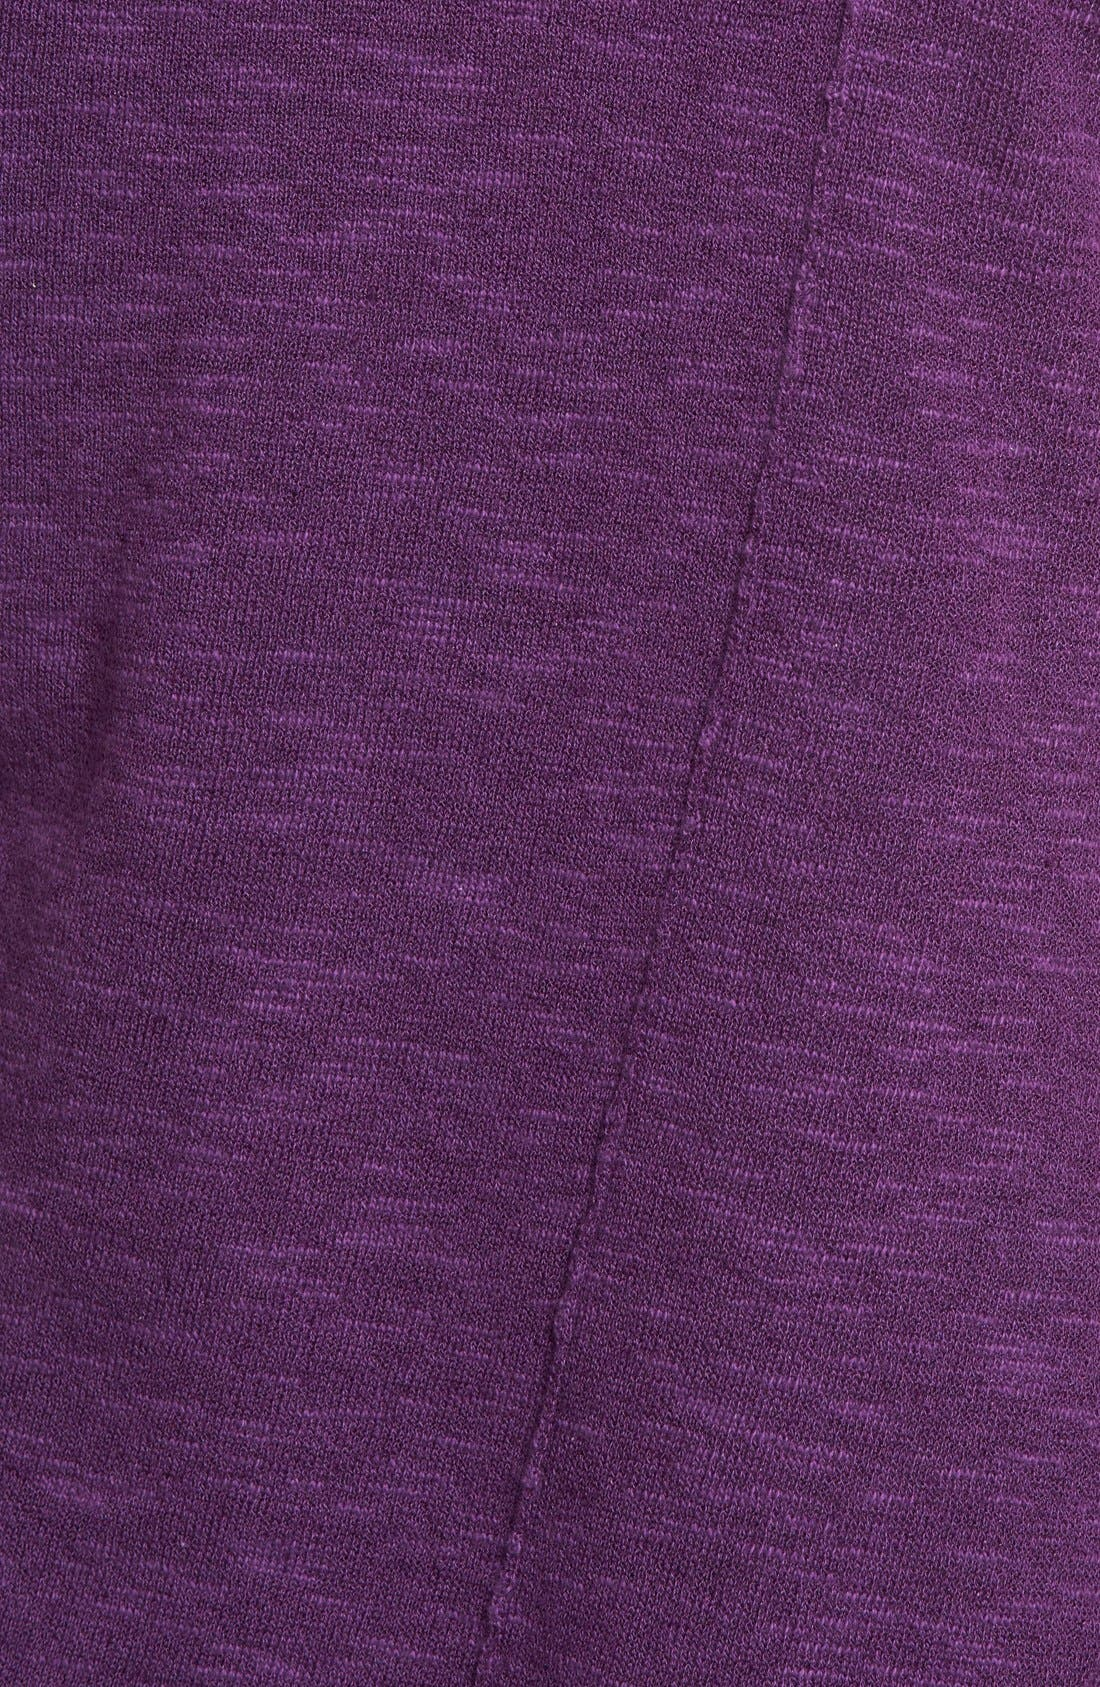 Cap Sleeve Organic Linen & Cotton Scoop Neck Top,                             Alternate thumbnail 33, color,